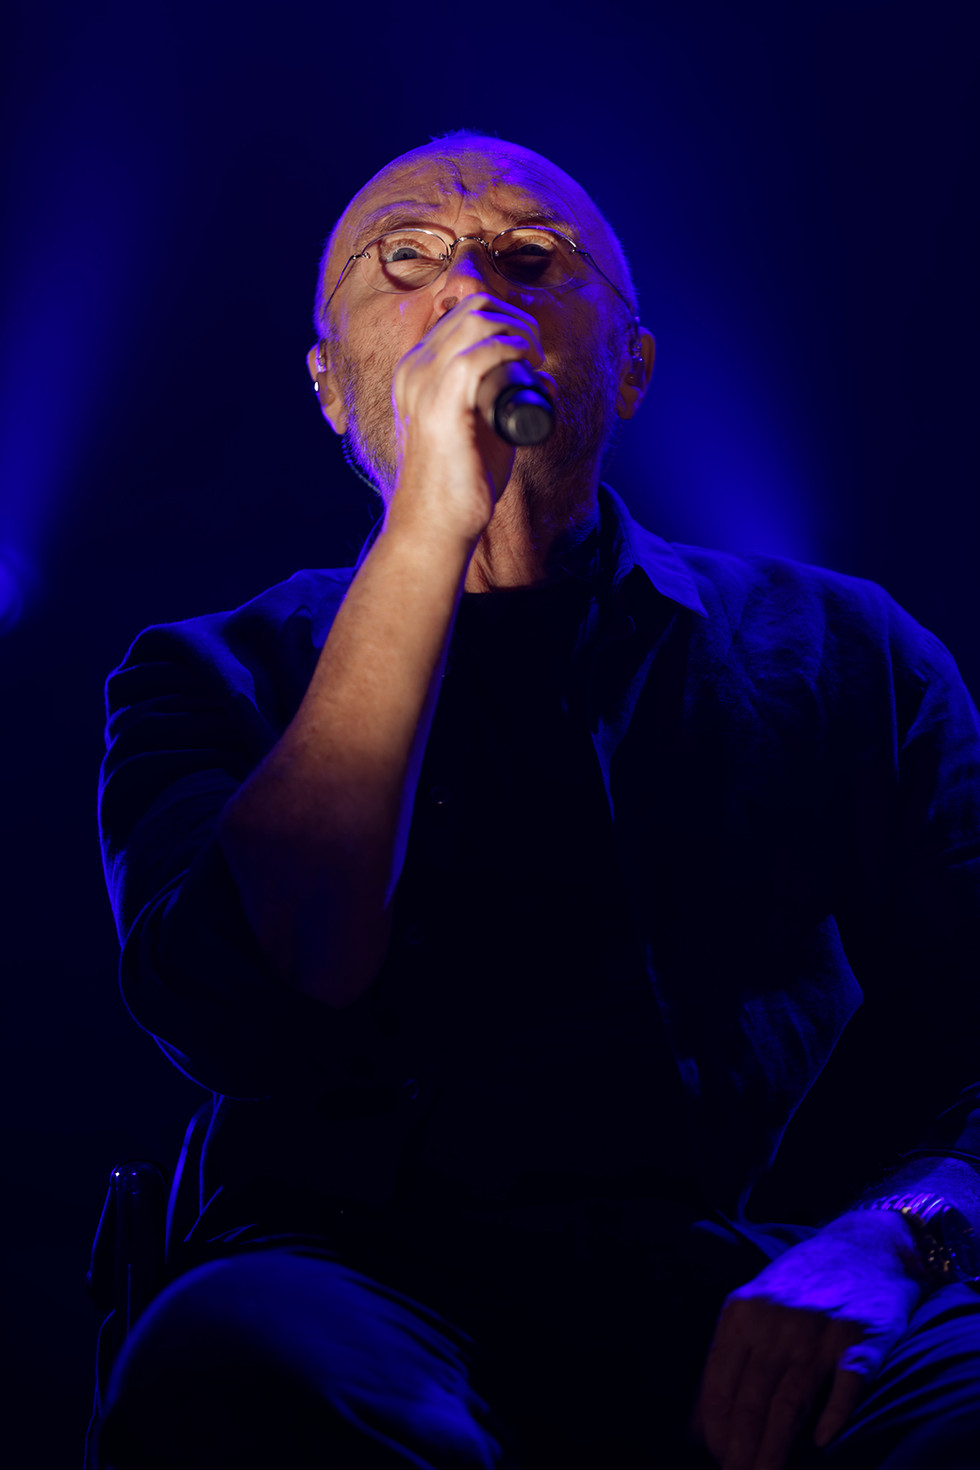 Phil Collins - Not Dead Yet